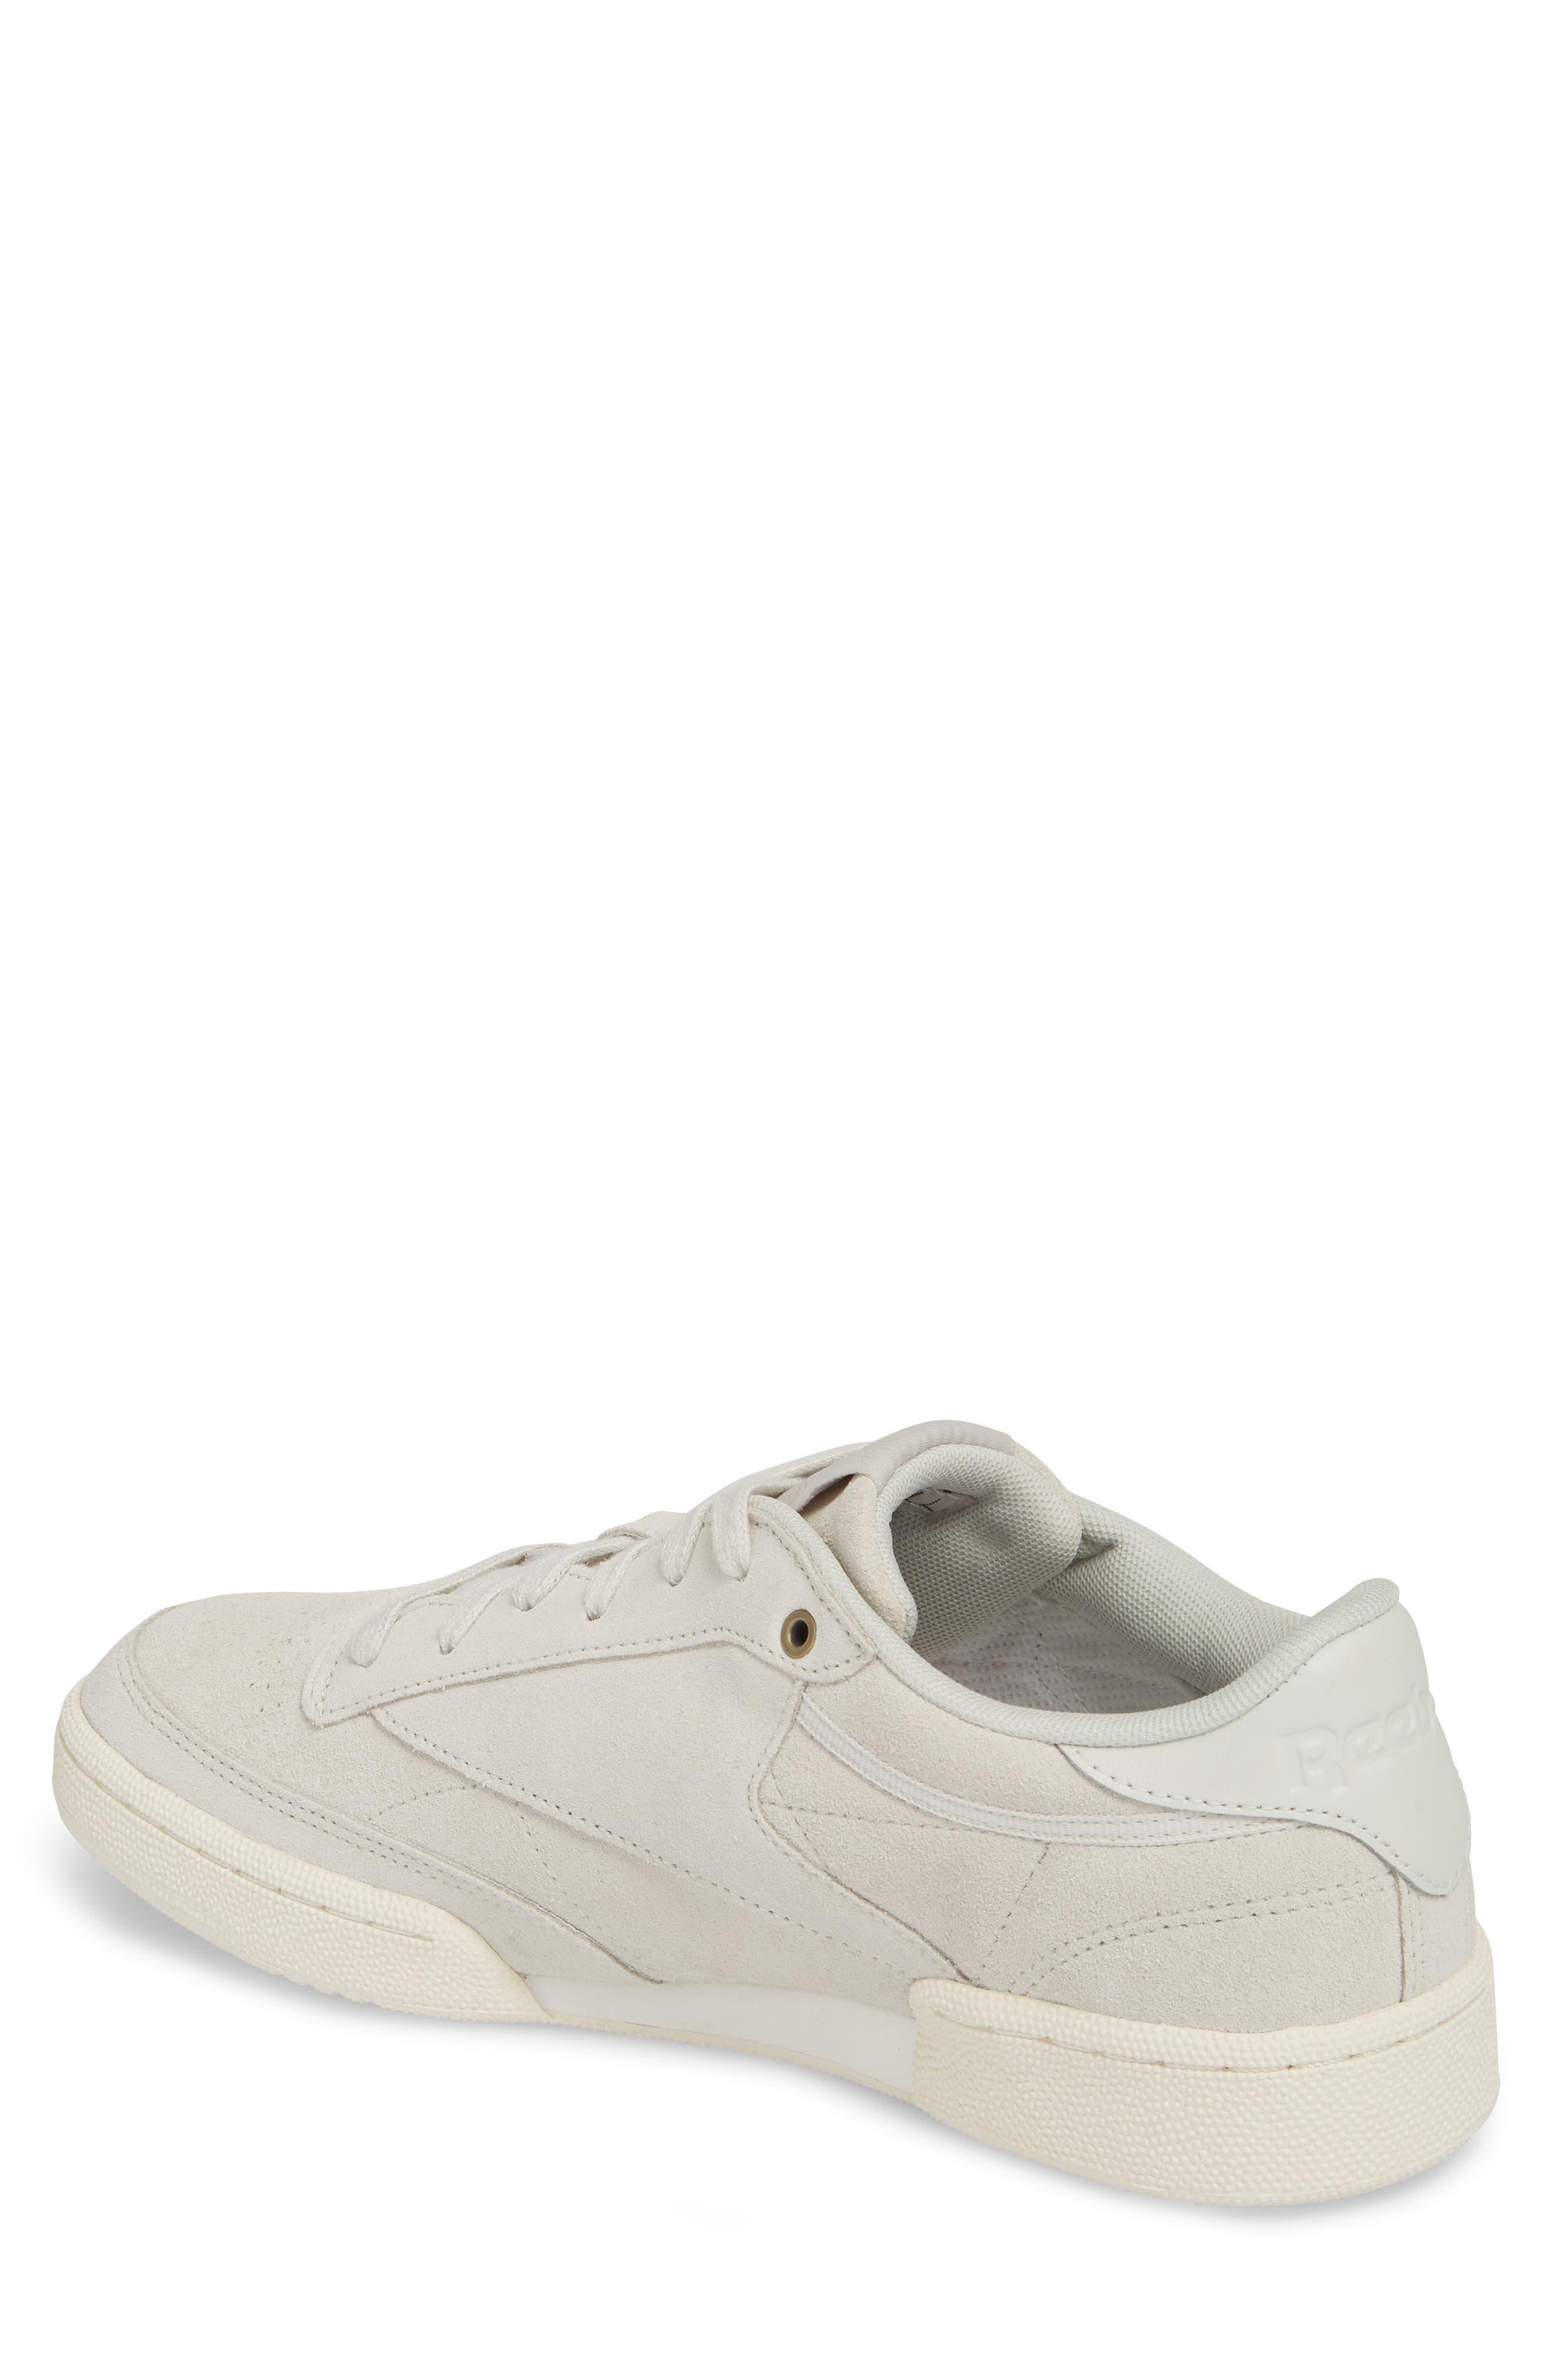 Club C 85 MCC Sneaker,                             Alternate thumbnail 2, color,                             020